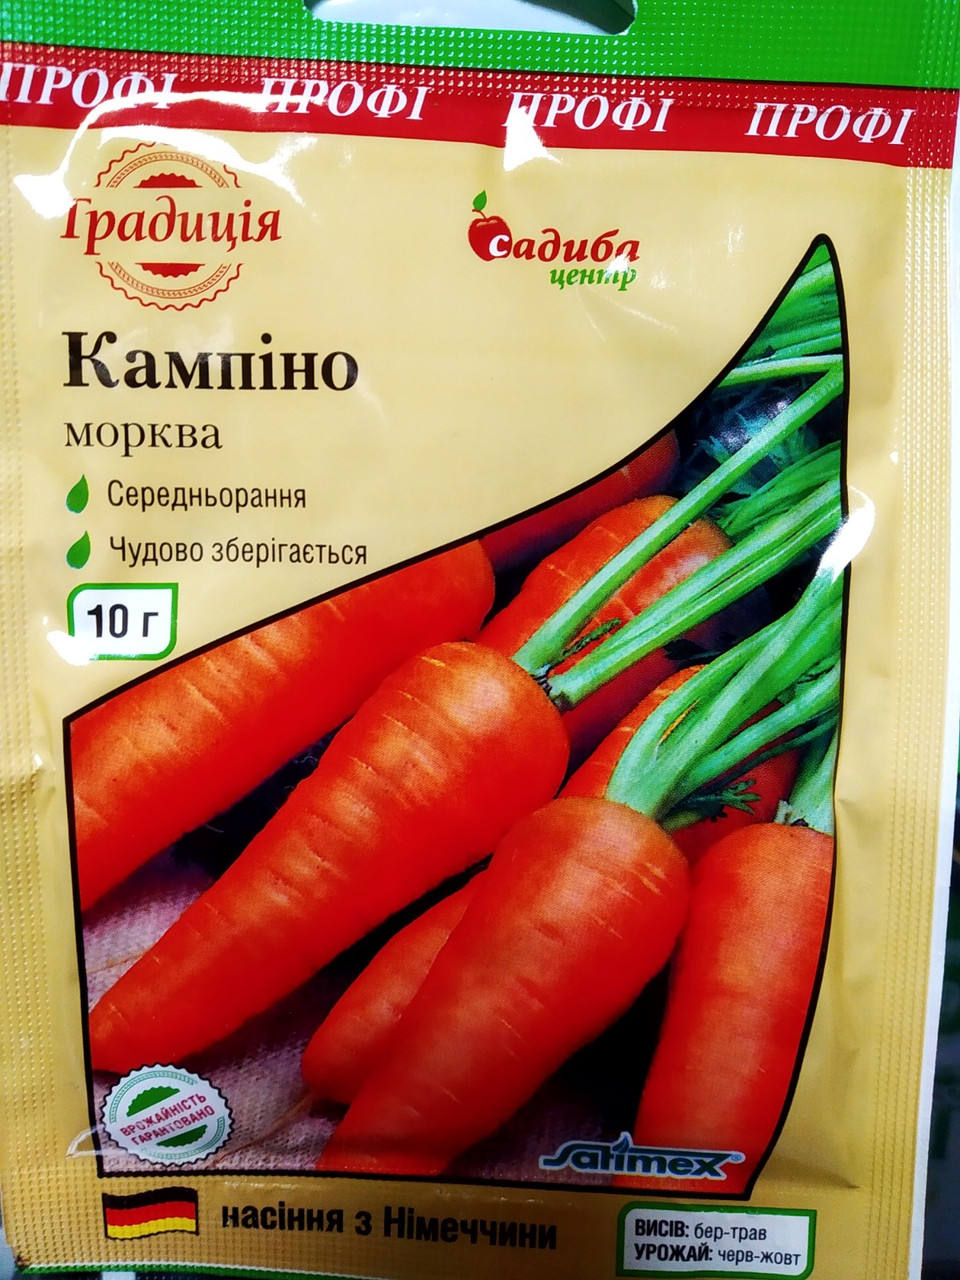 Семена Морковь Кампино сорт среднеранняя 10 грамм семян для хранения Satimex Германия